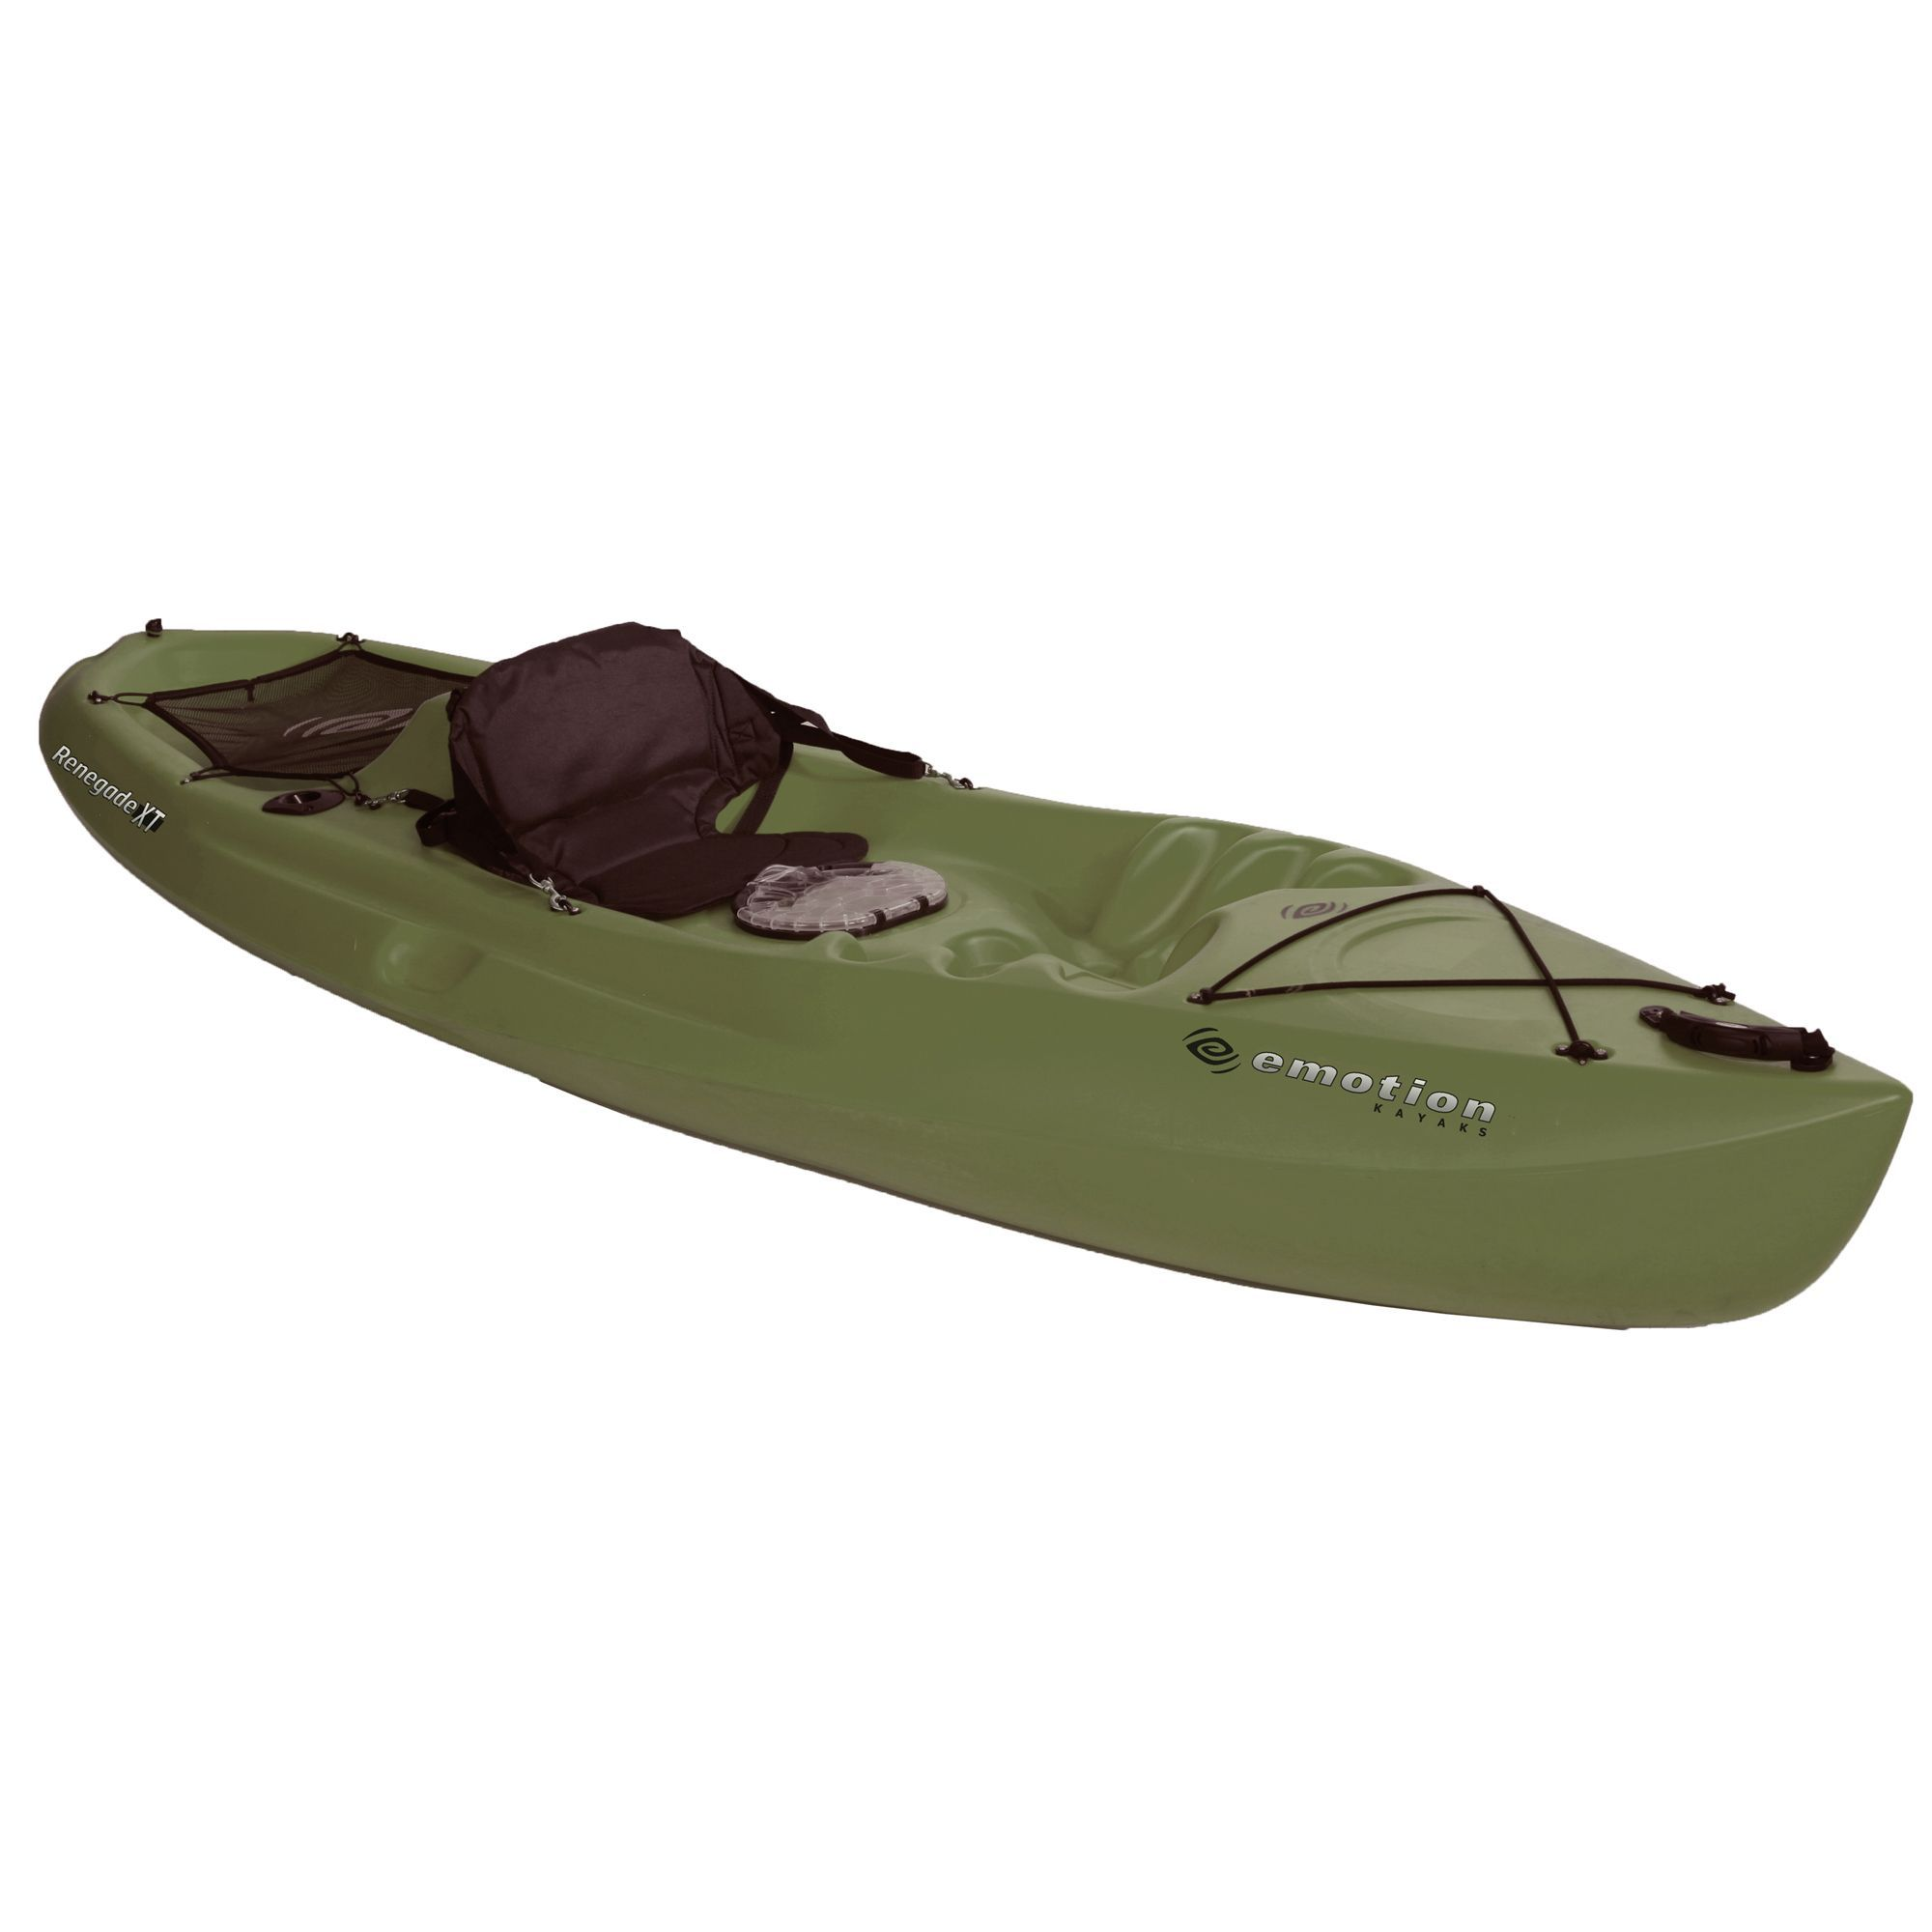 Emotion Renegade XT Kayak (Olive Green), Lifetime